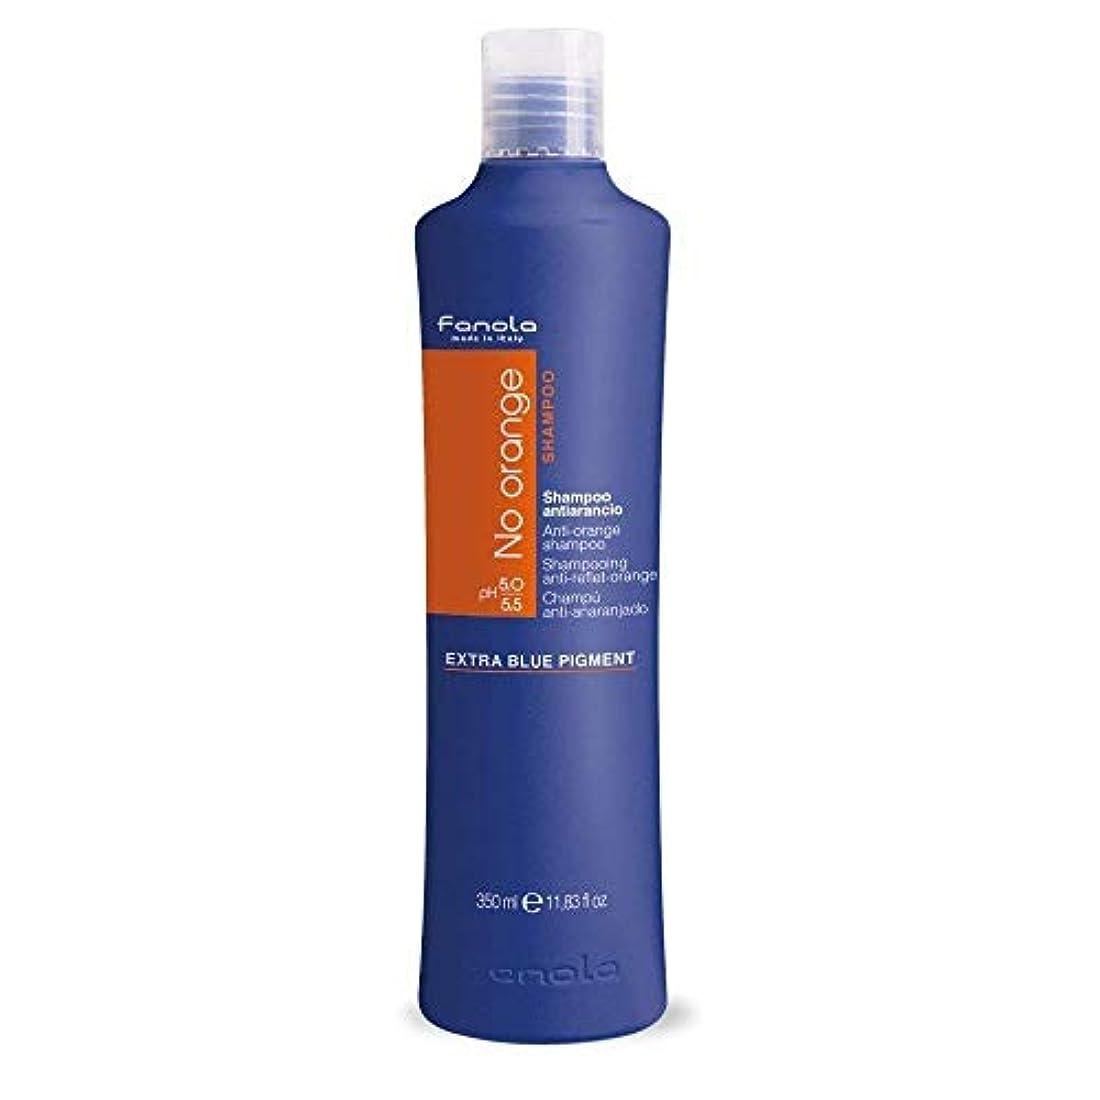 Fanola No Orange Shampoo 350 ml  青カラーシャンプー ノーオレンジ シャンプー 海外直送 [並行輸入品]